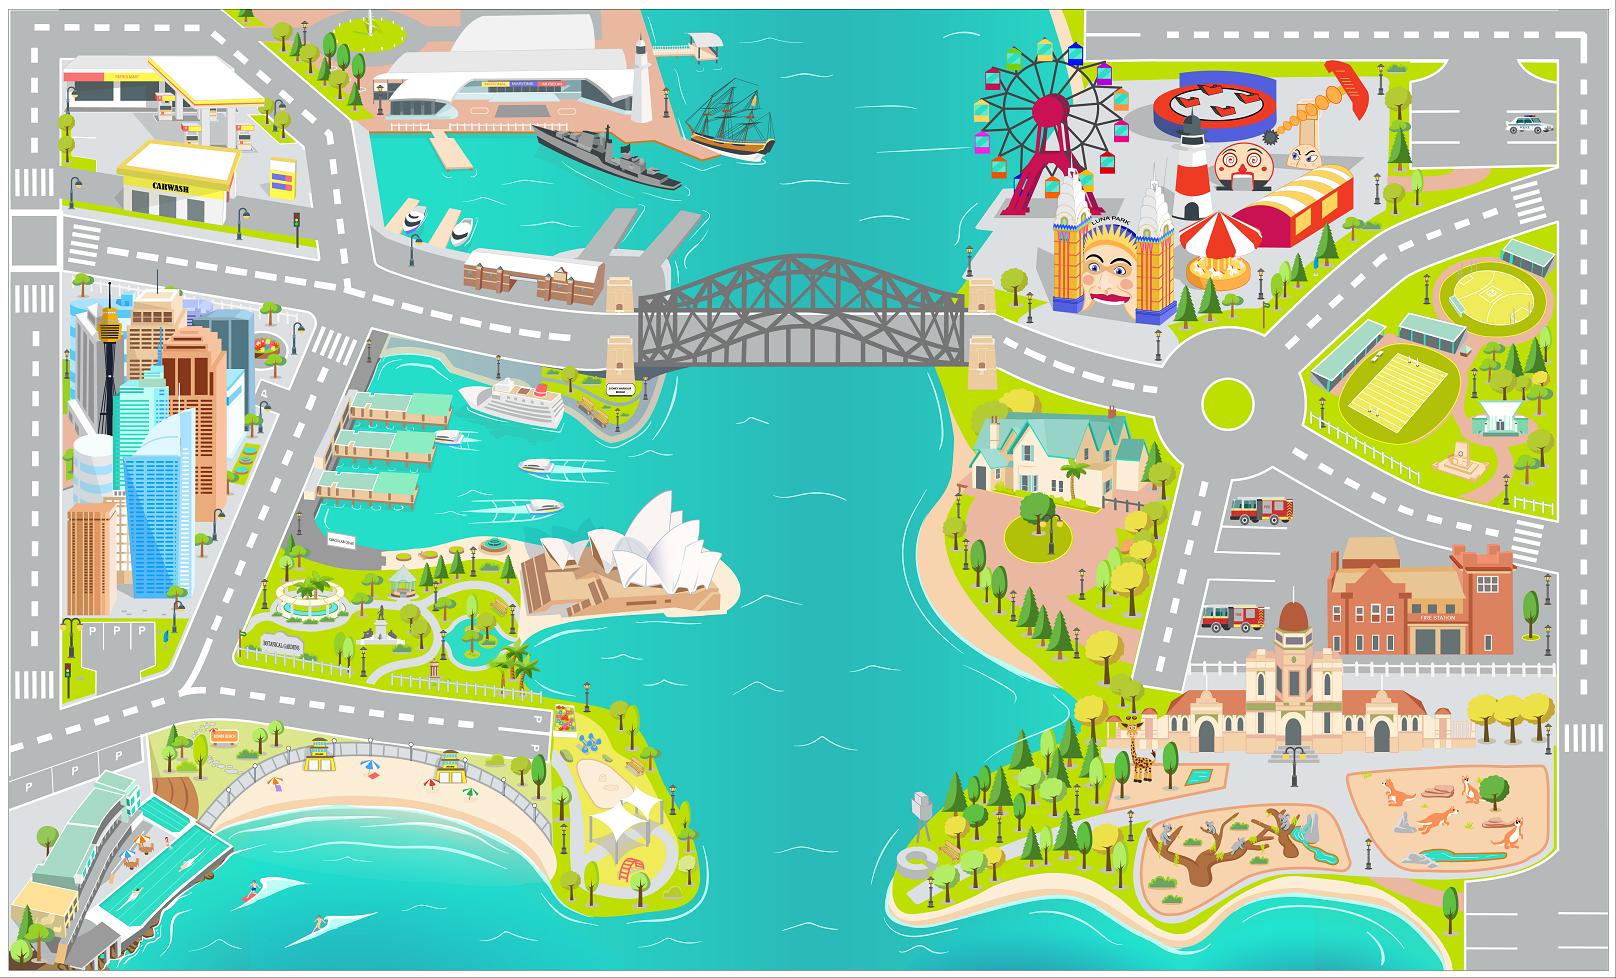 Sydney City Kids Play Mat Design / Illustration